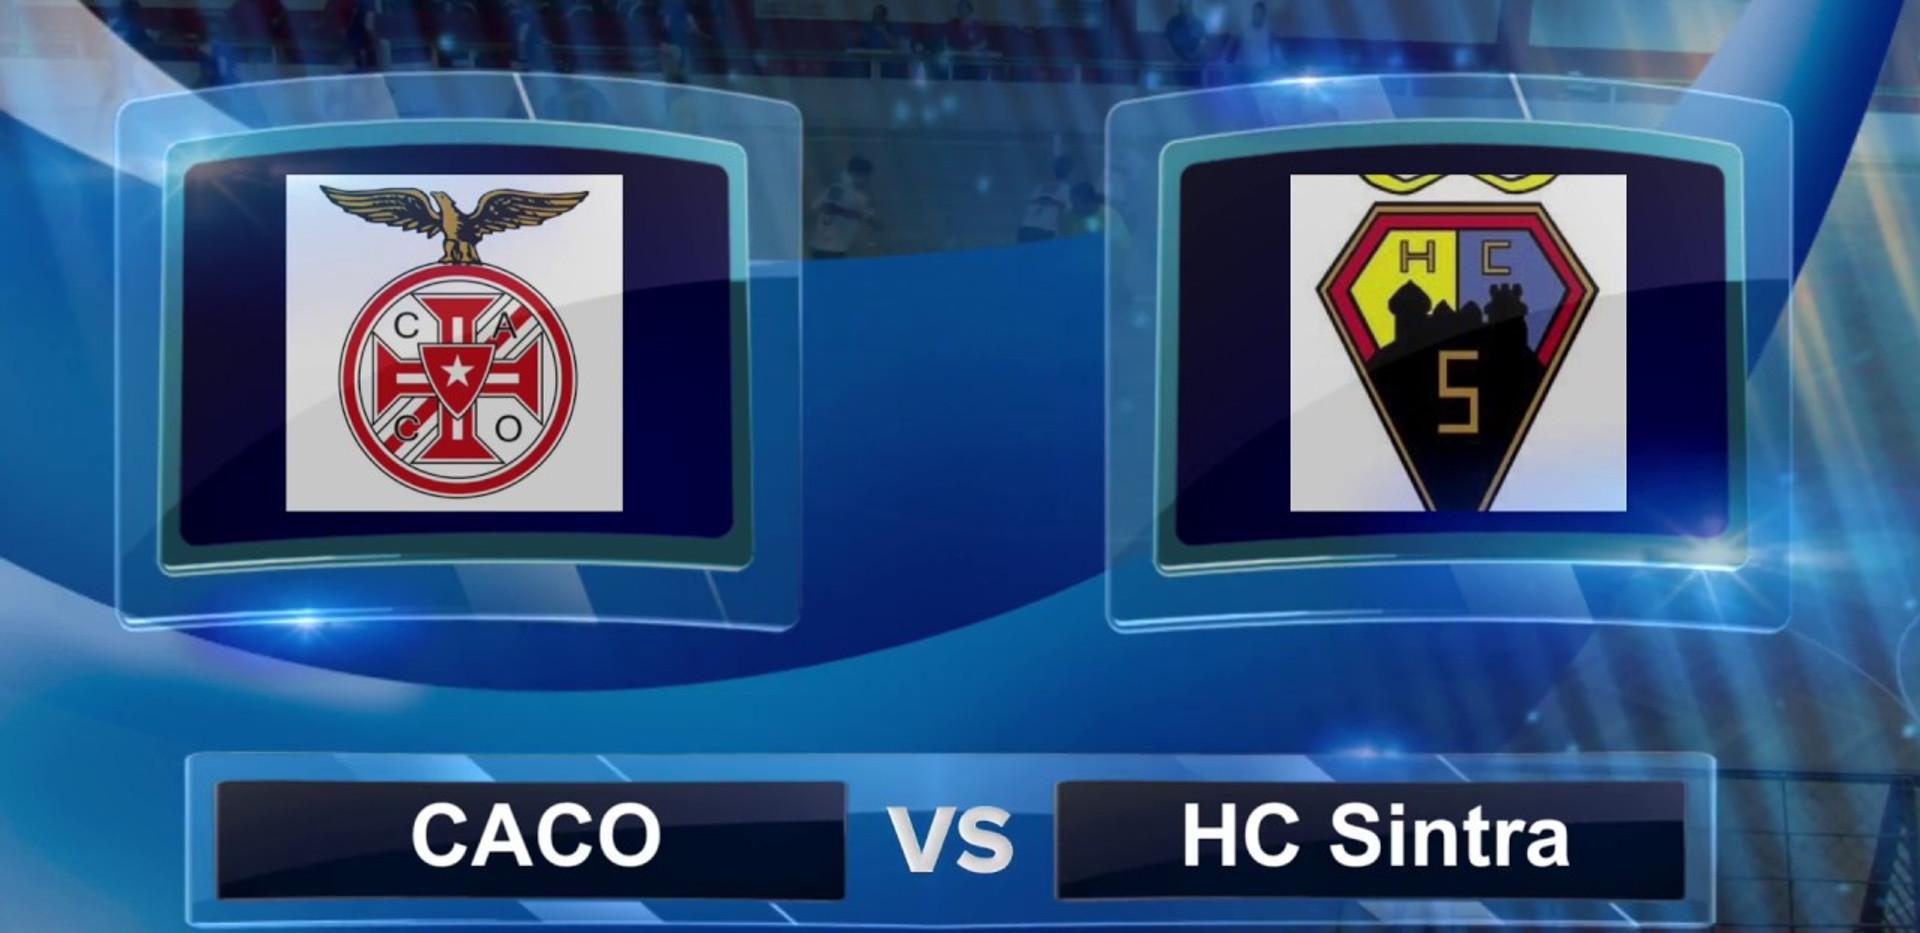 CACO 7-3 HC Sintra